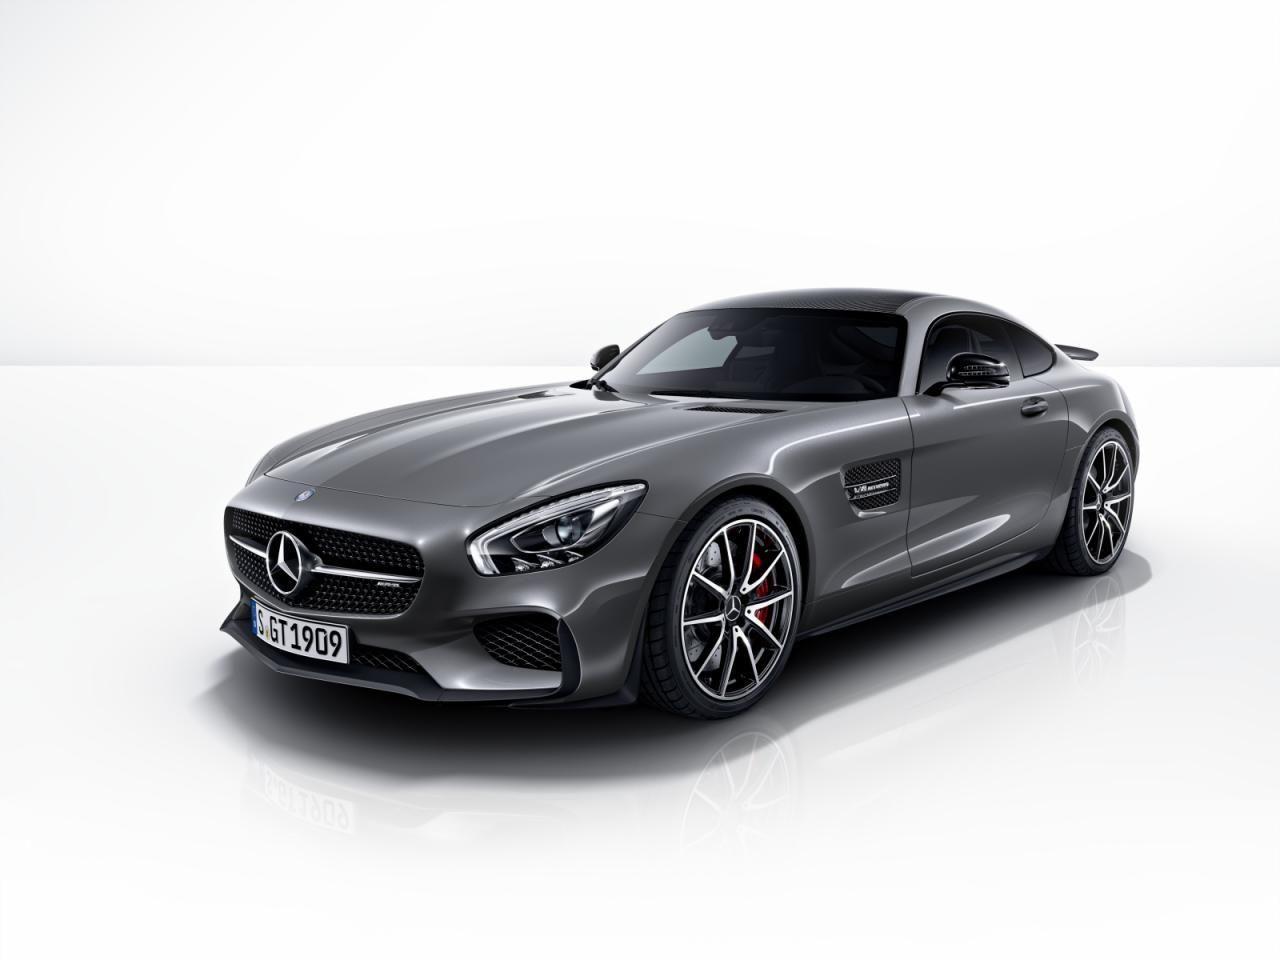 Mercedes Amg Gt Mercedes Amg Gt S New Mercedes Amg New Mercedes 2016 mercedes benz amg gt s 2